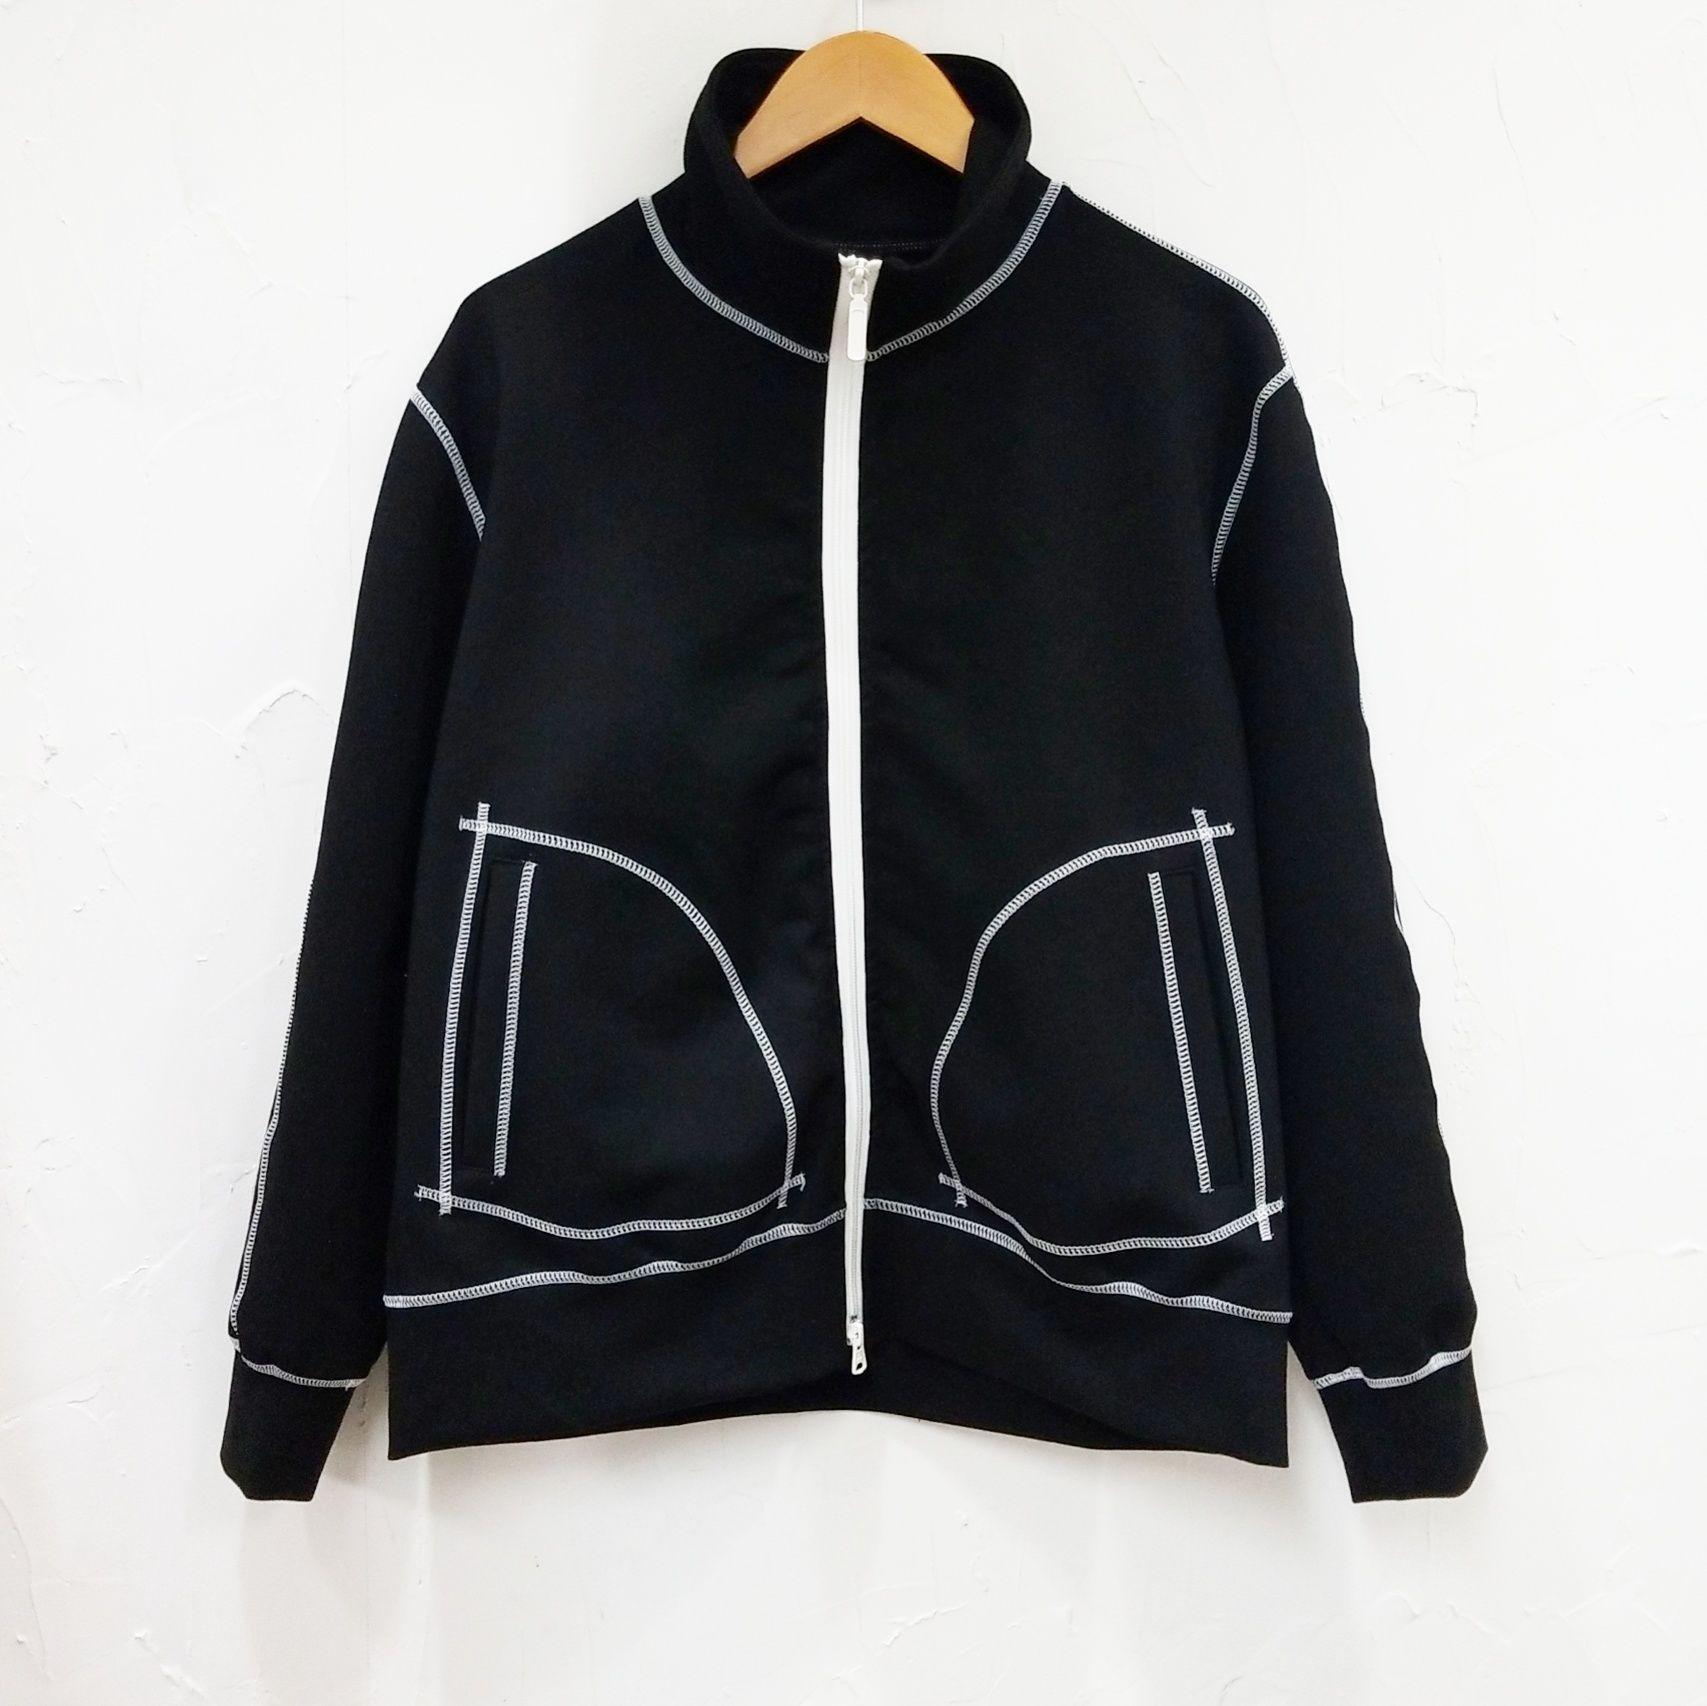 Liss リス design stitch jersey TRACK JK (メンズ)